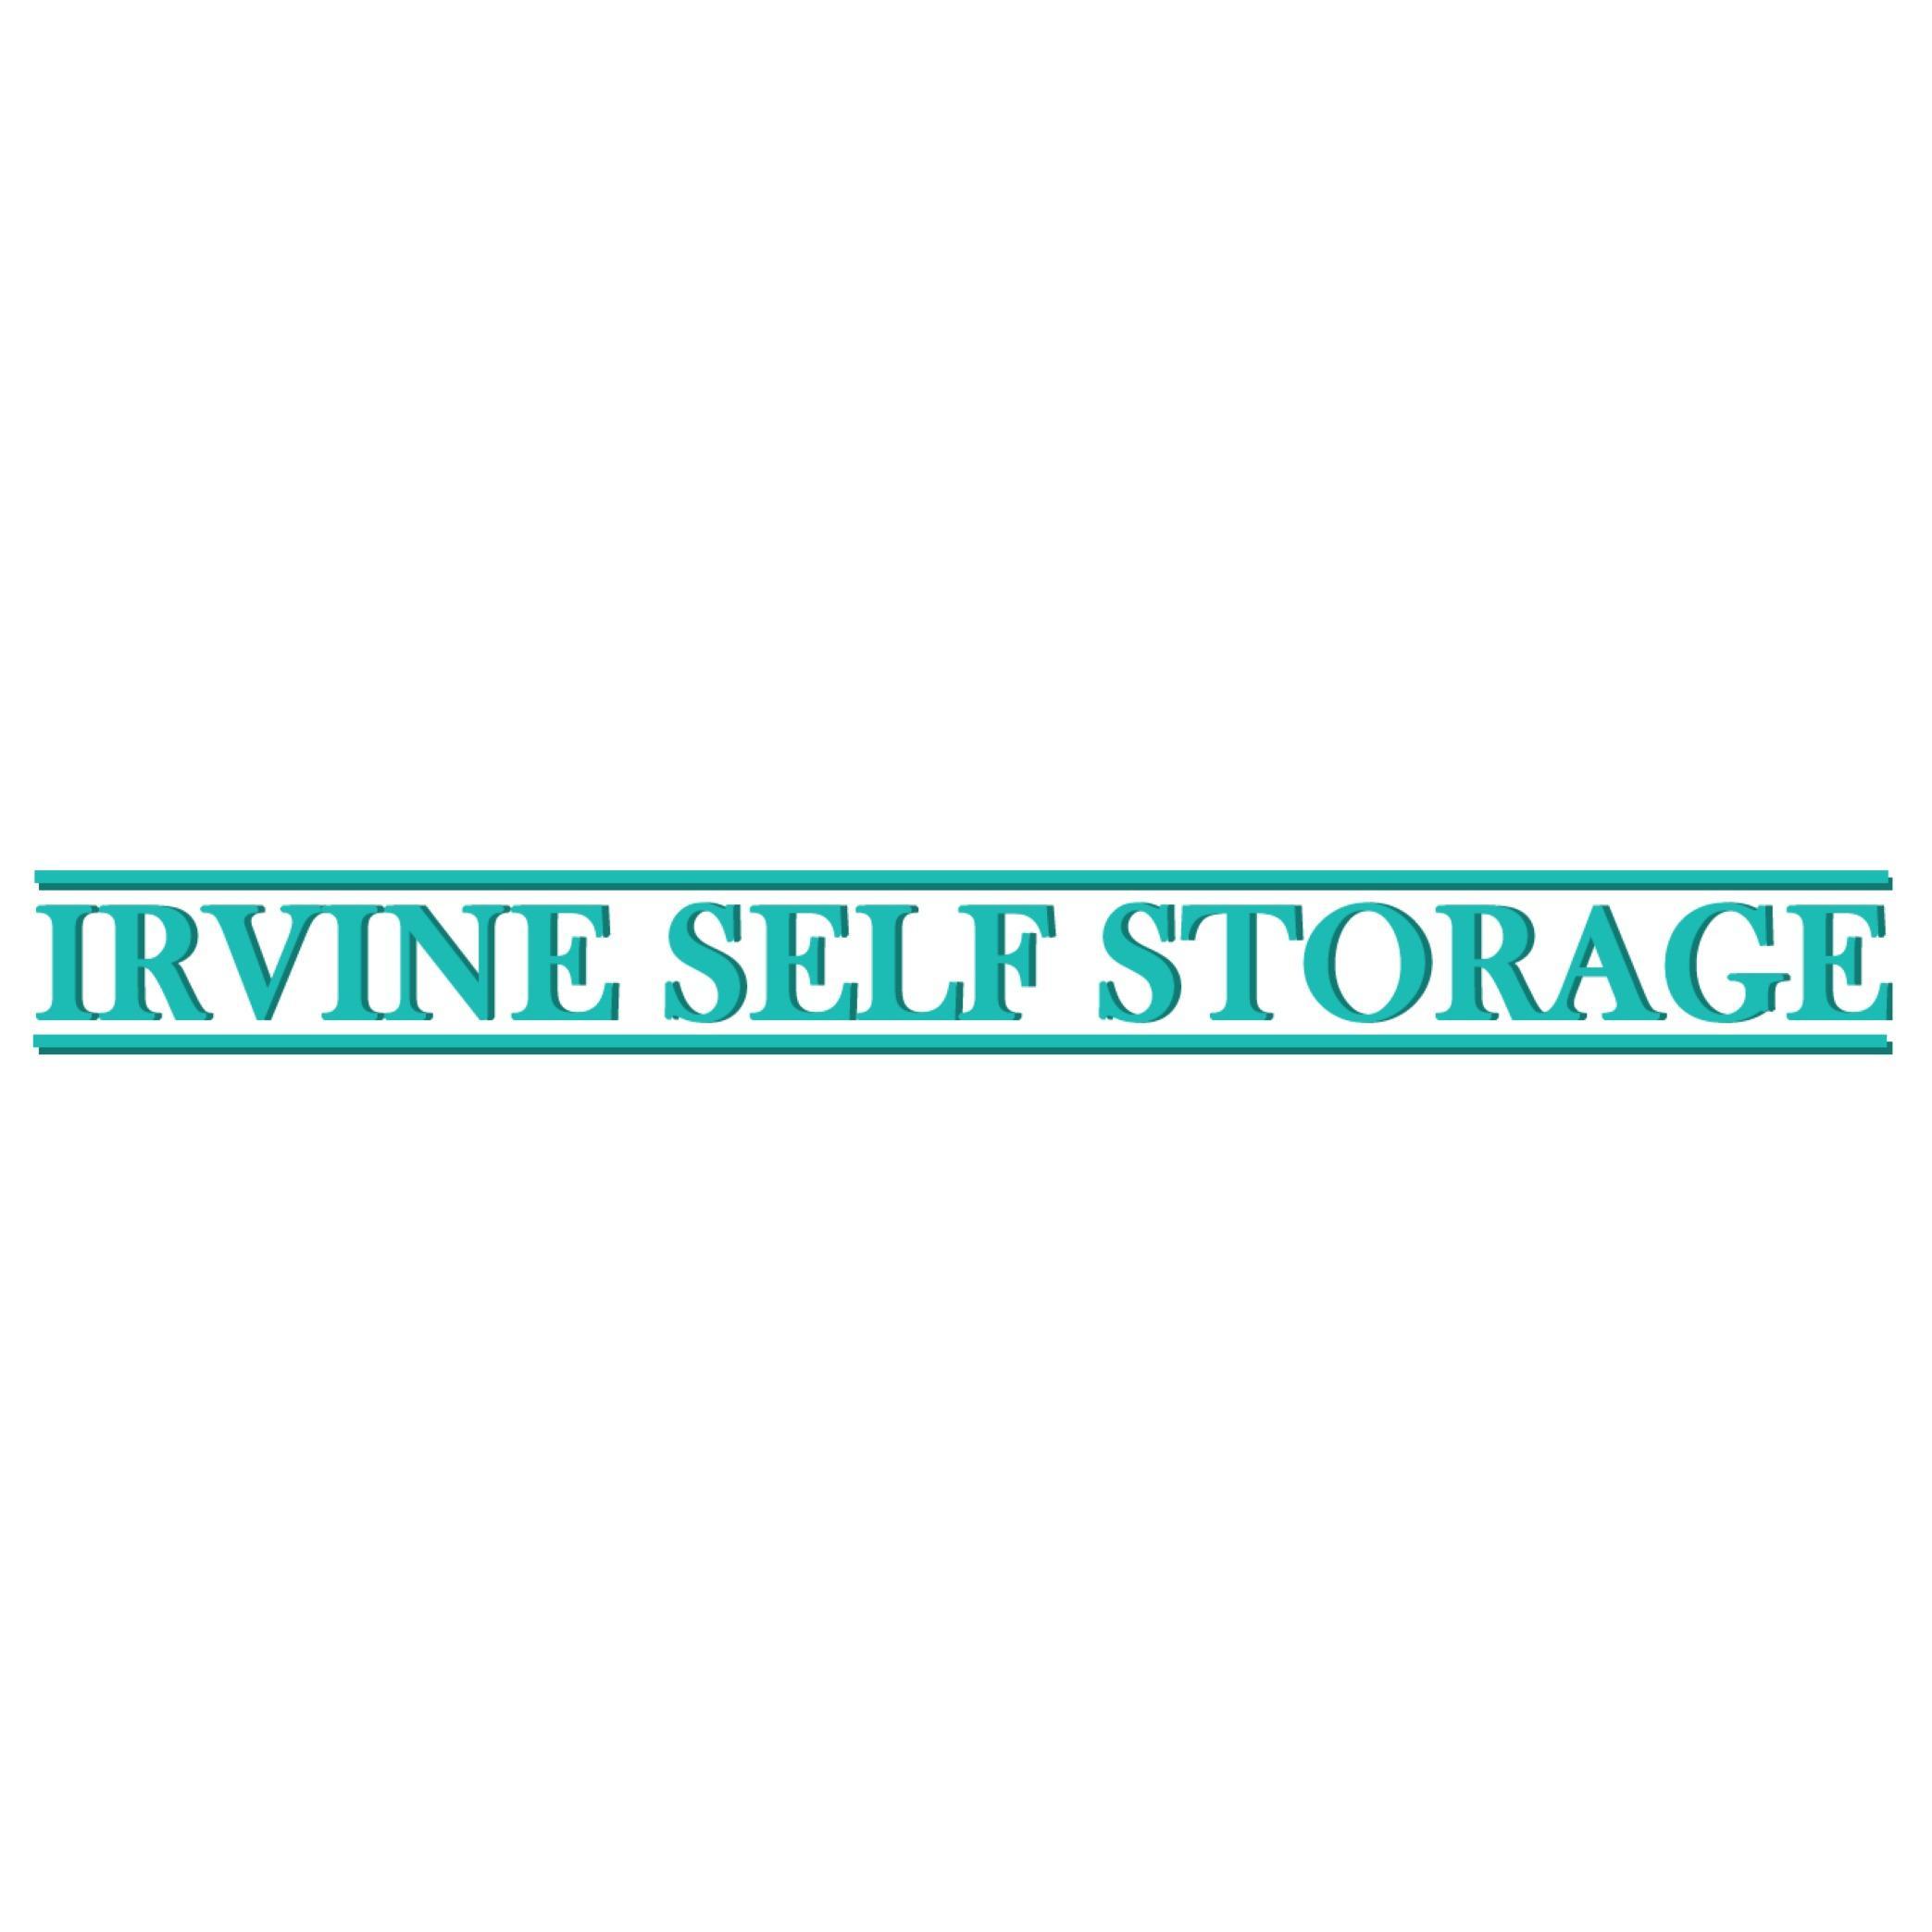 Irvine Self Storage - Irvine, CA 92614 - (949)851-7900 | ShowMeLocal.com